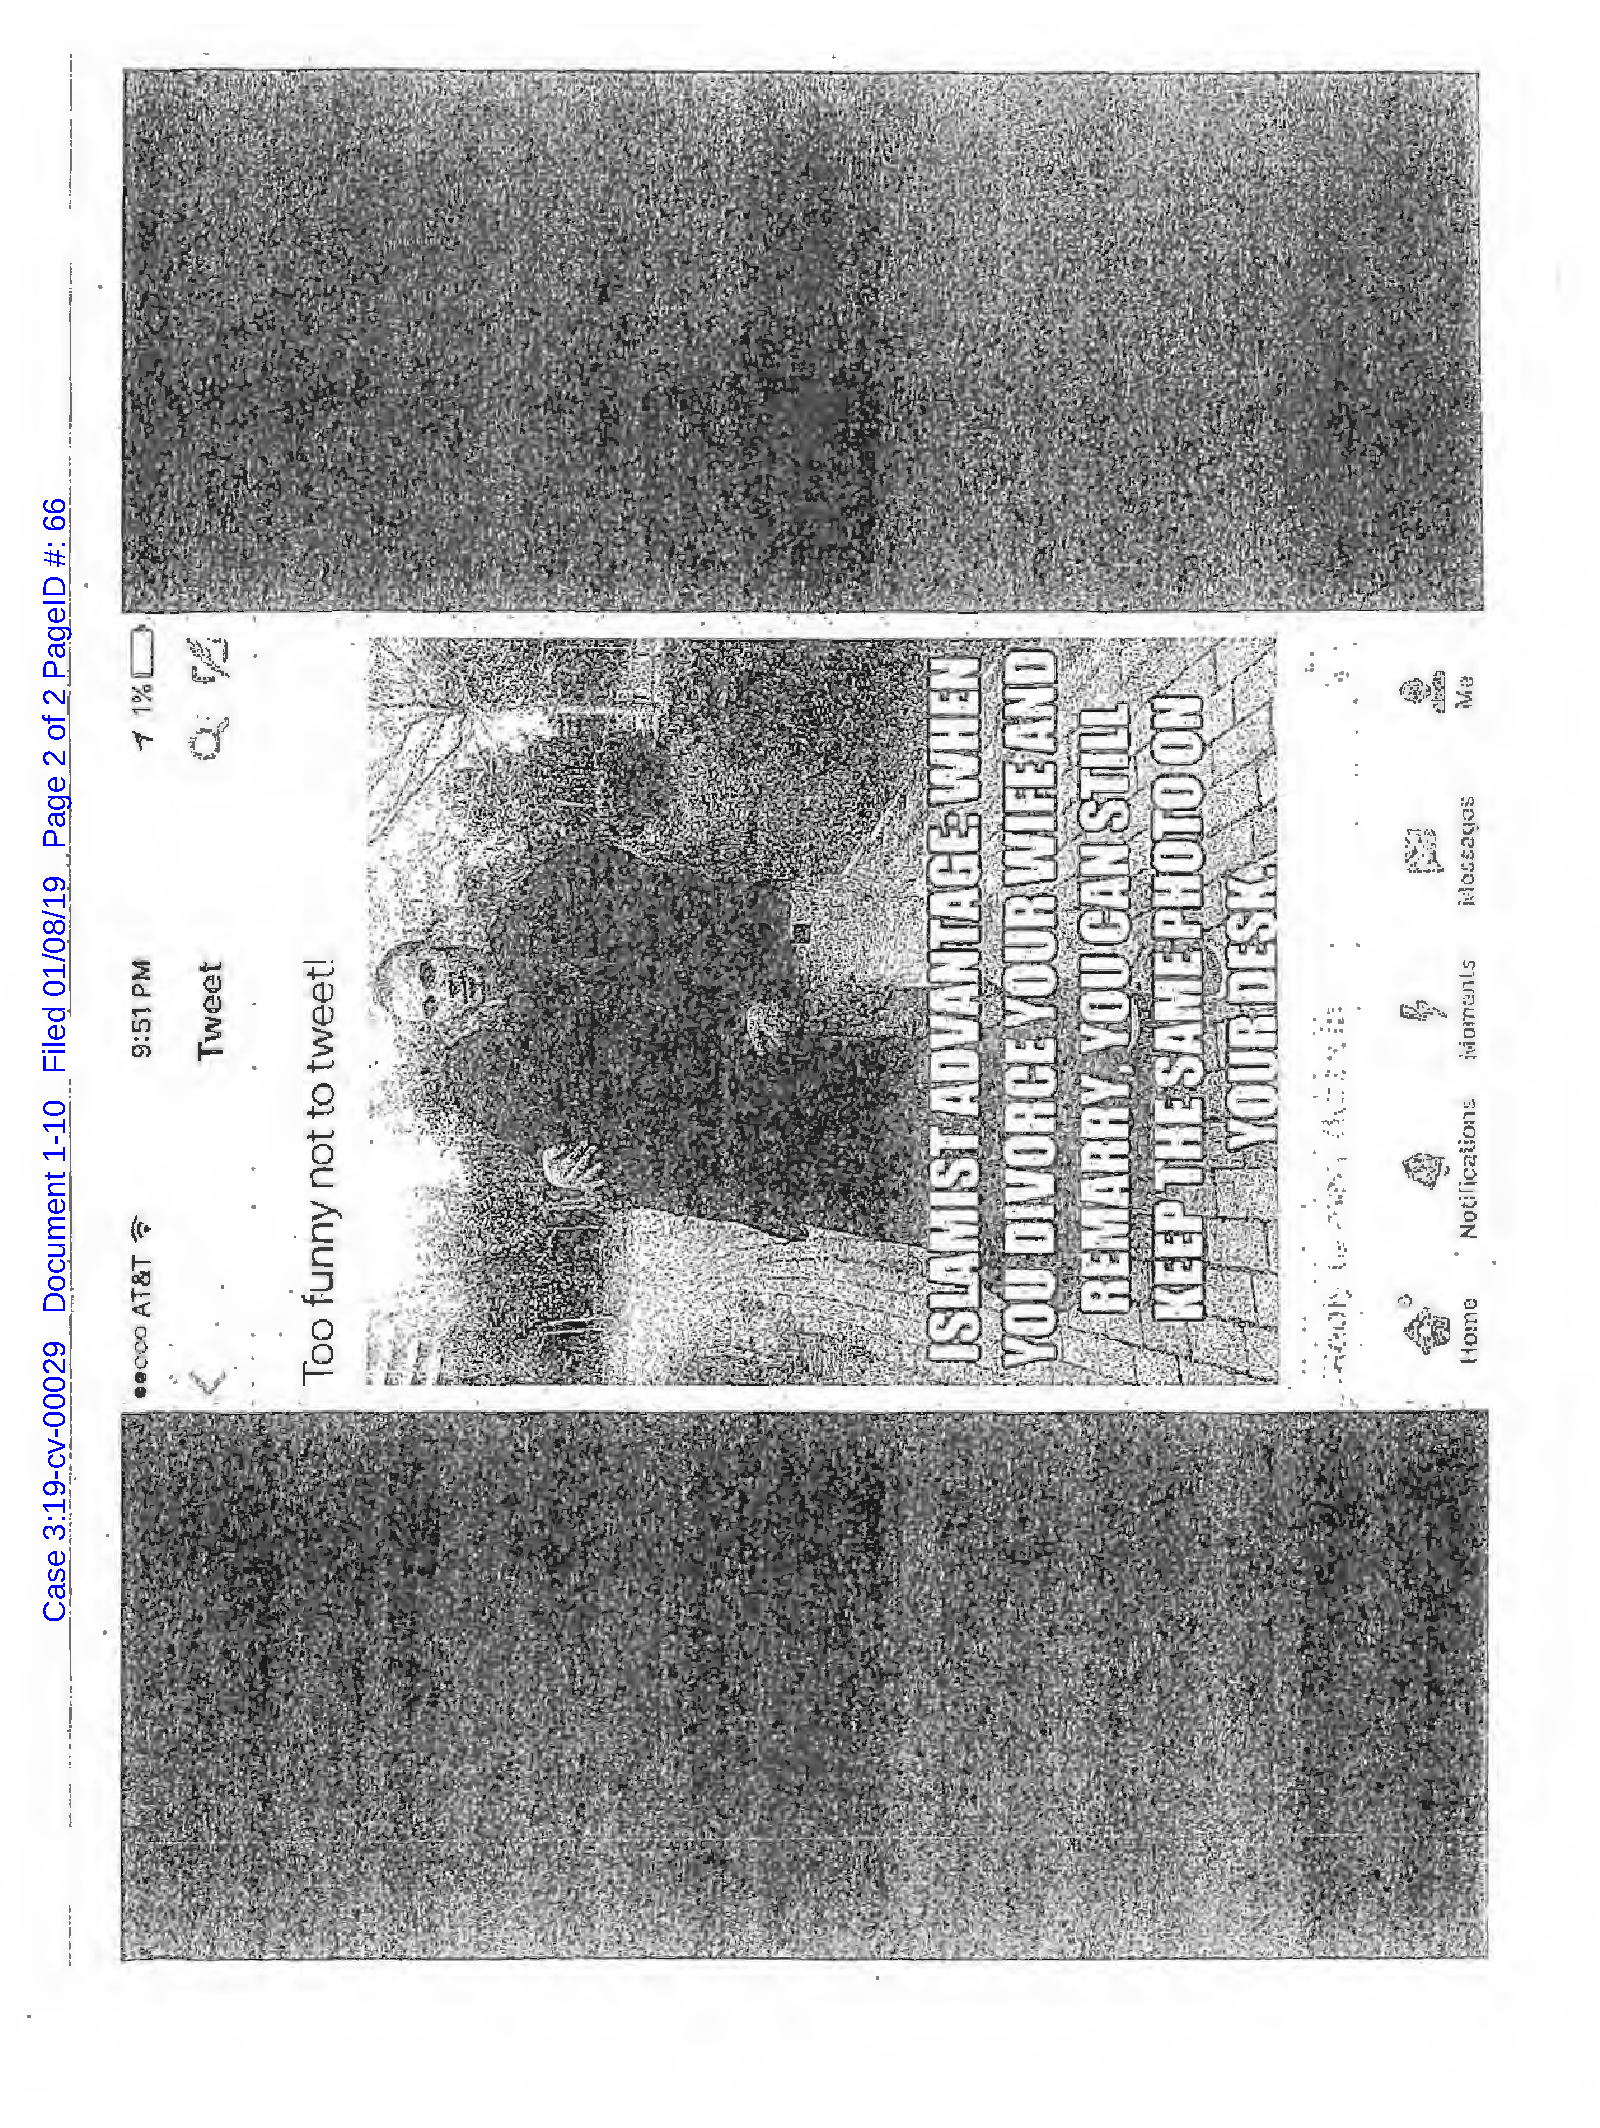 Copy of 2021-03-28_2-04-102.png